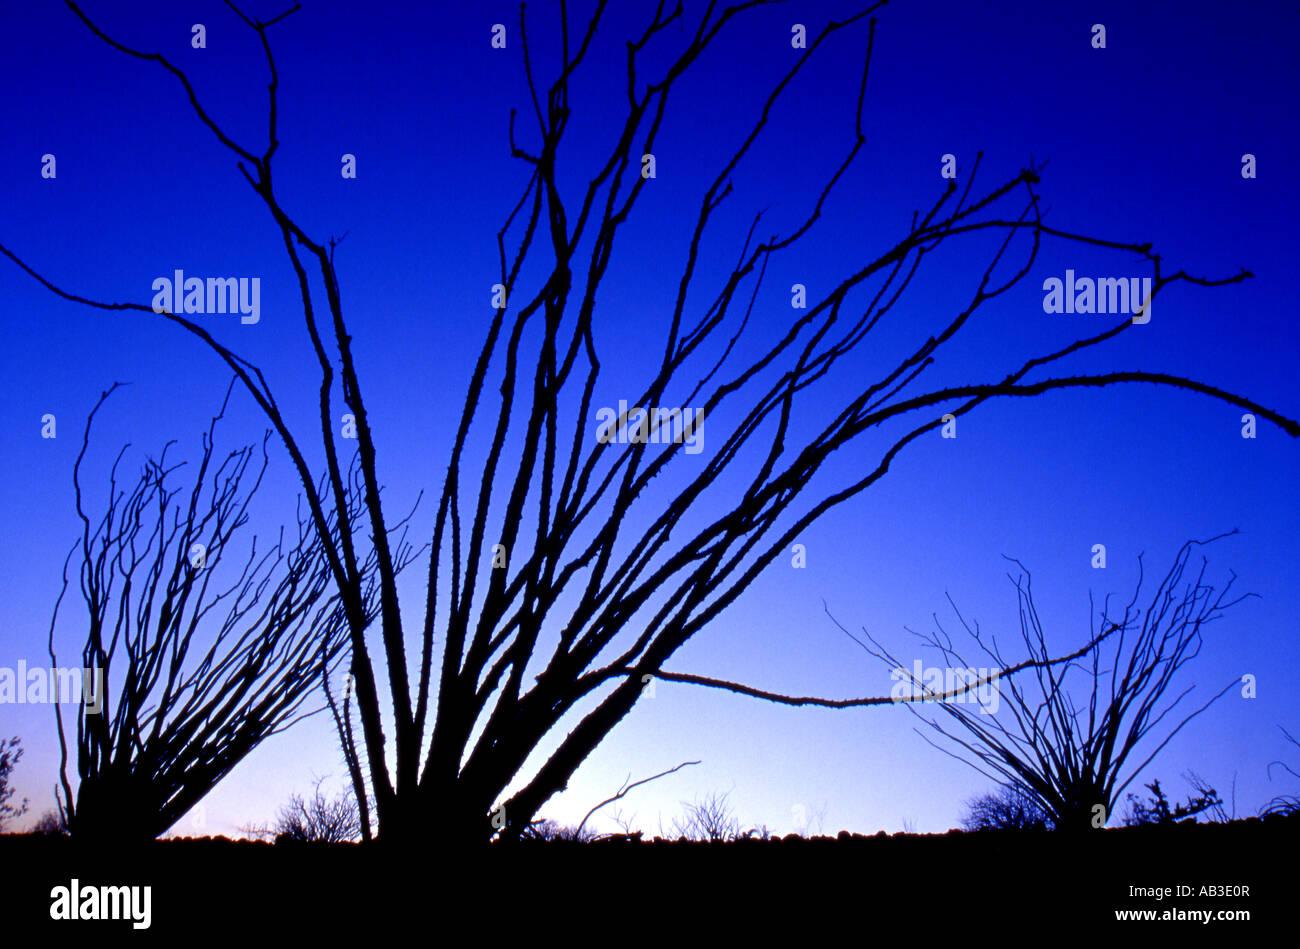 Ocotillos Anza Borrego Desert State Park Borrego Springs San Diego County California United States USA - Stock Image